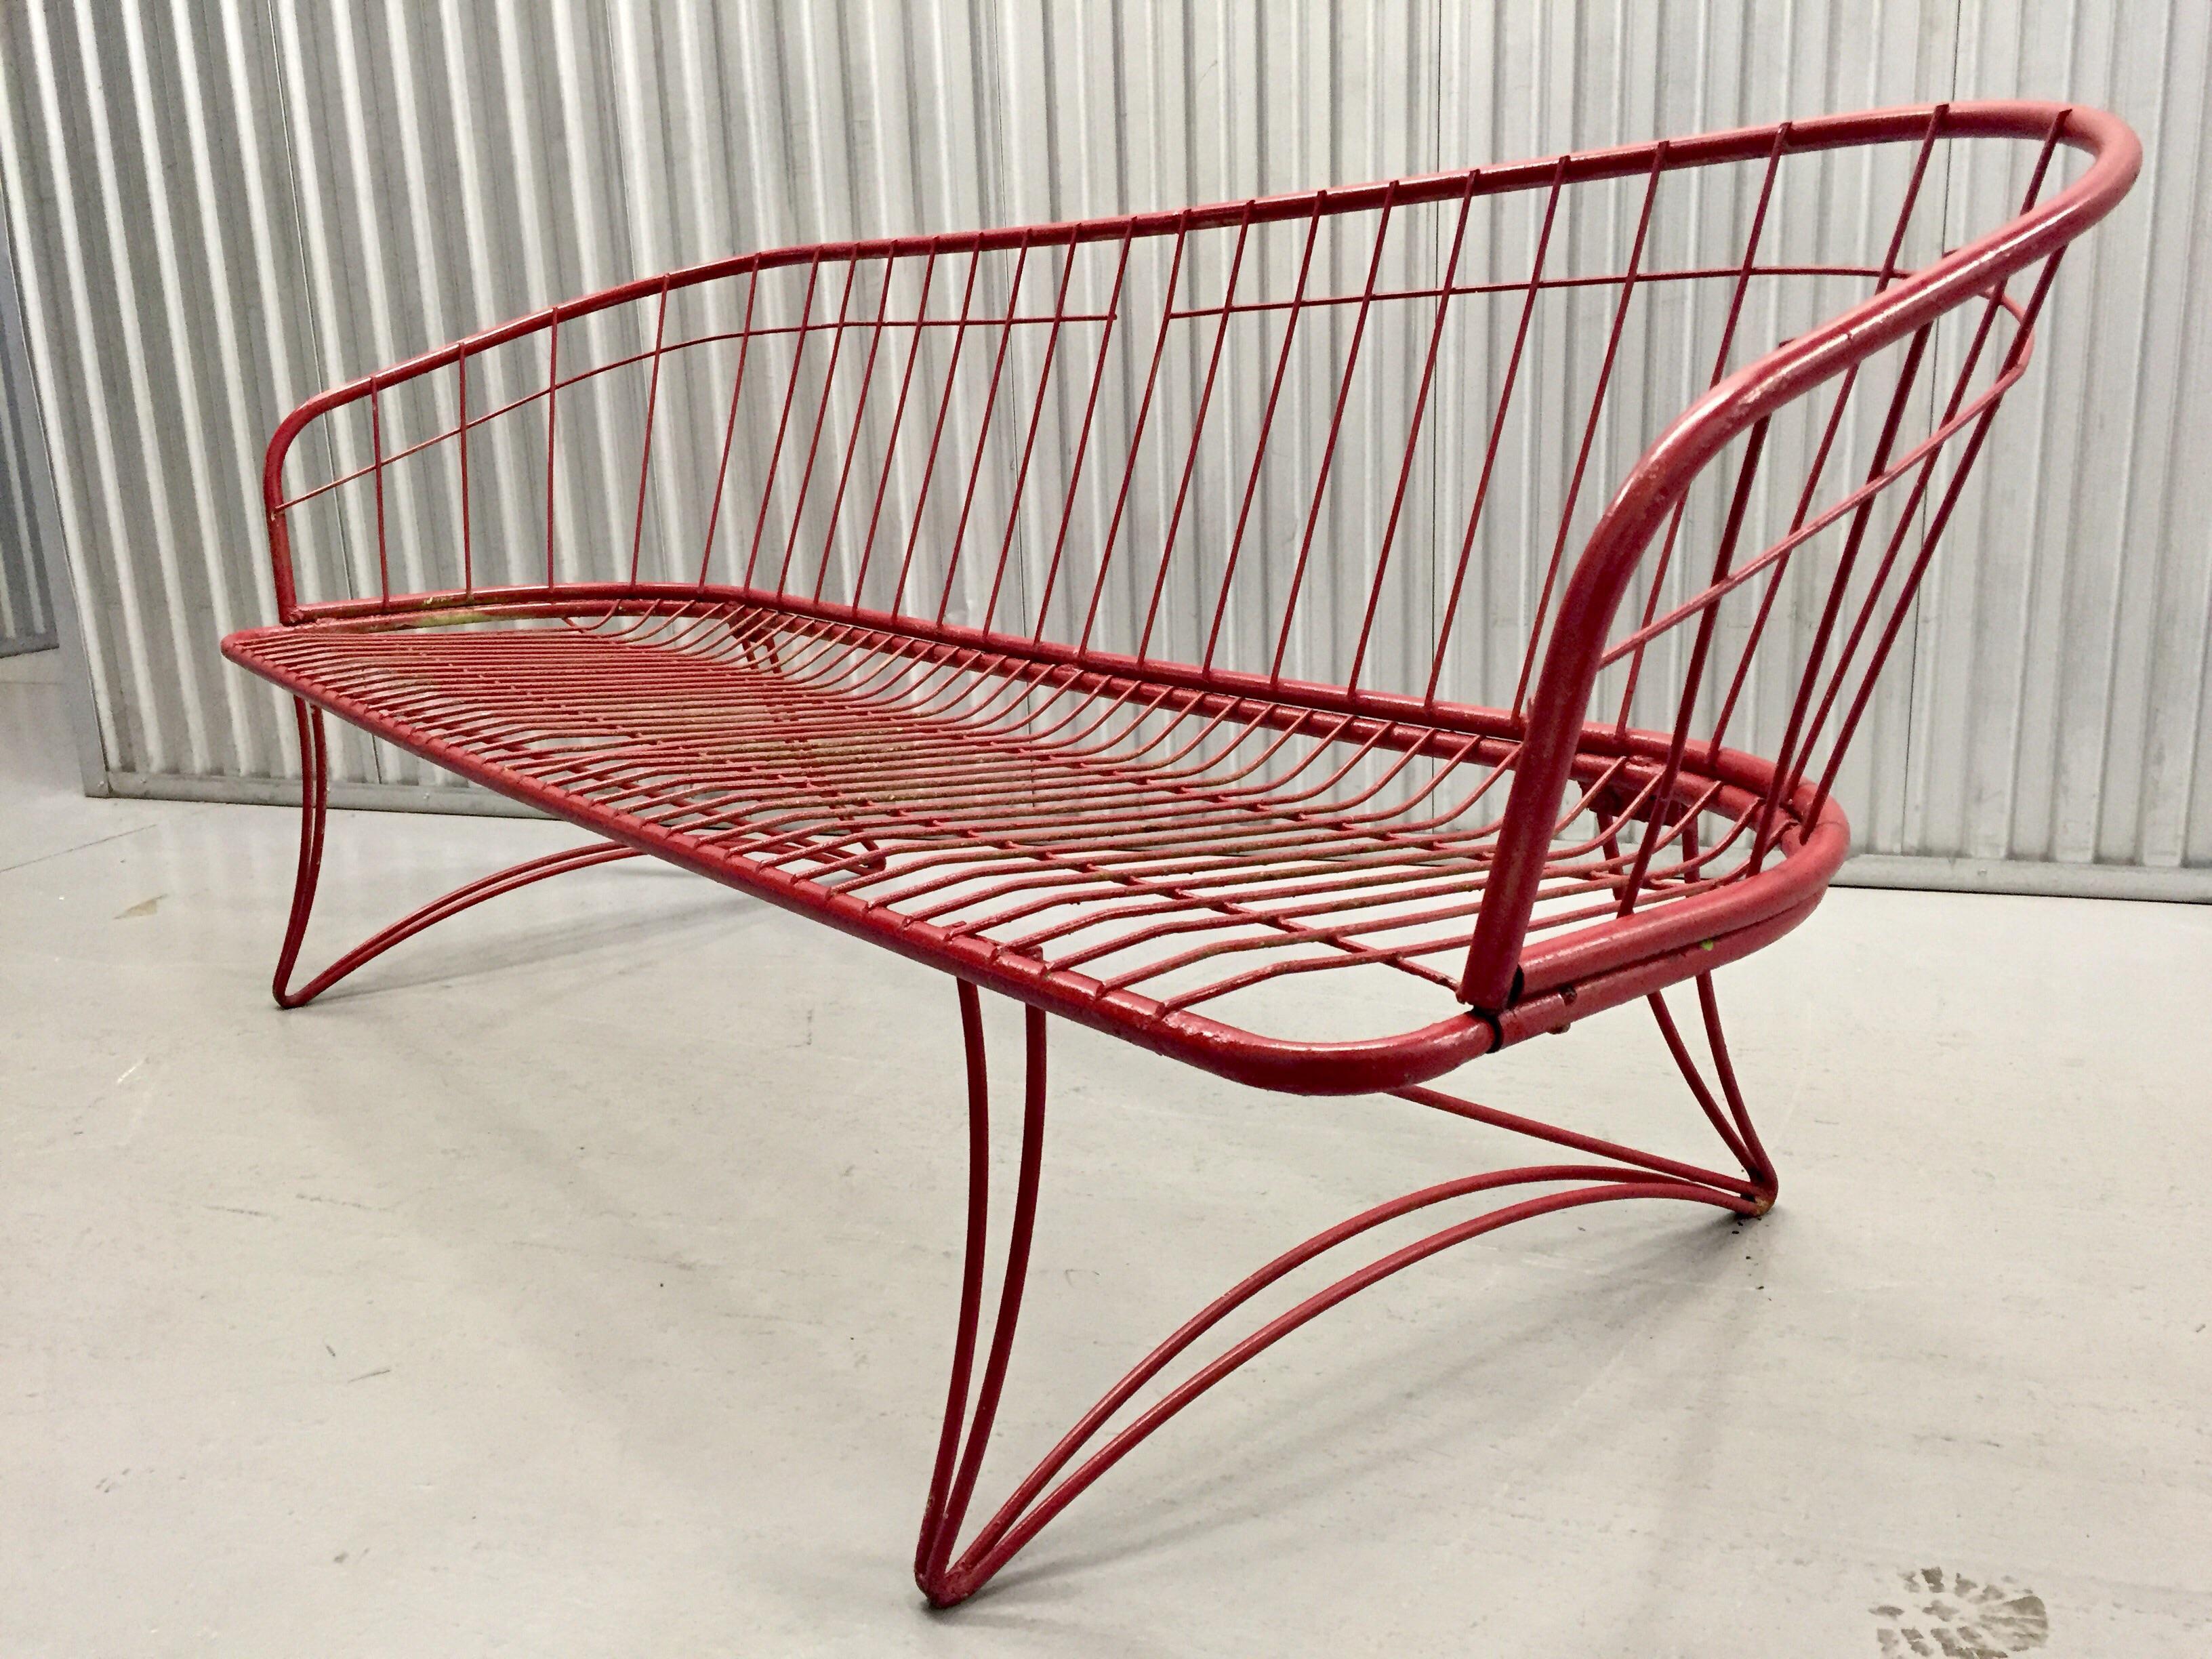 modern metal outdoor furniture. Homecrest Mid-Century Modern Metal Patio Sofa - Image 2 Of 10 Outdoor Furniture M